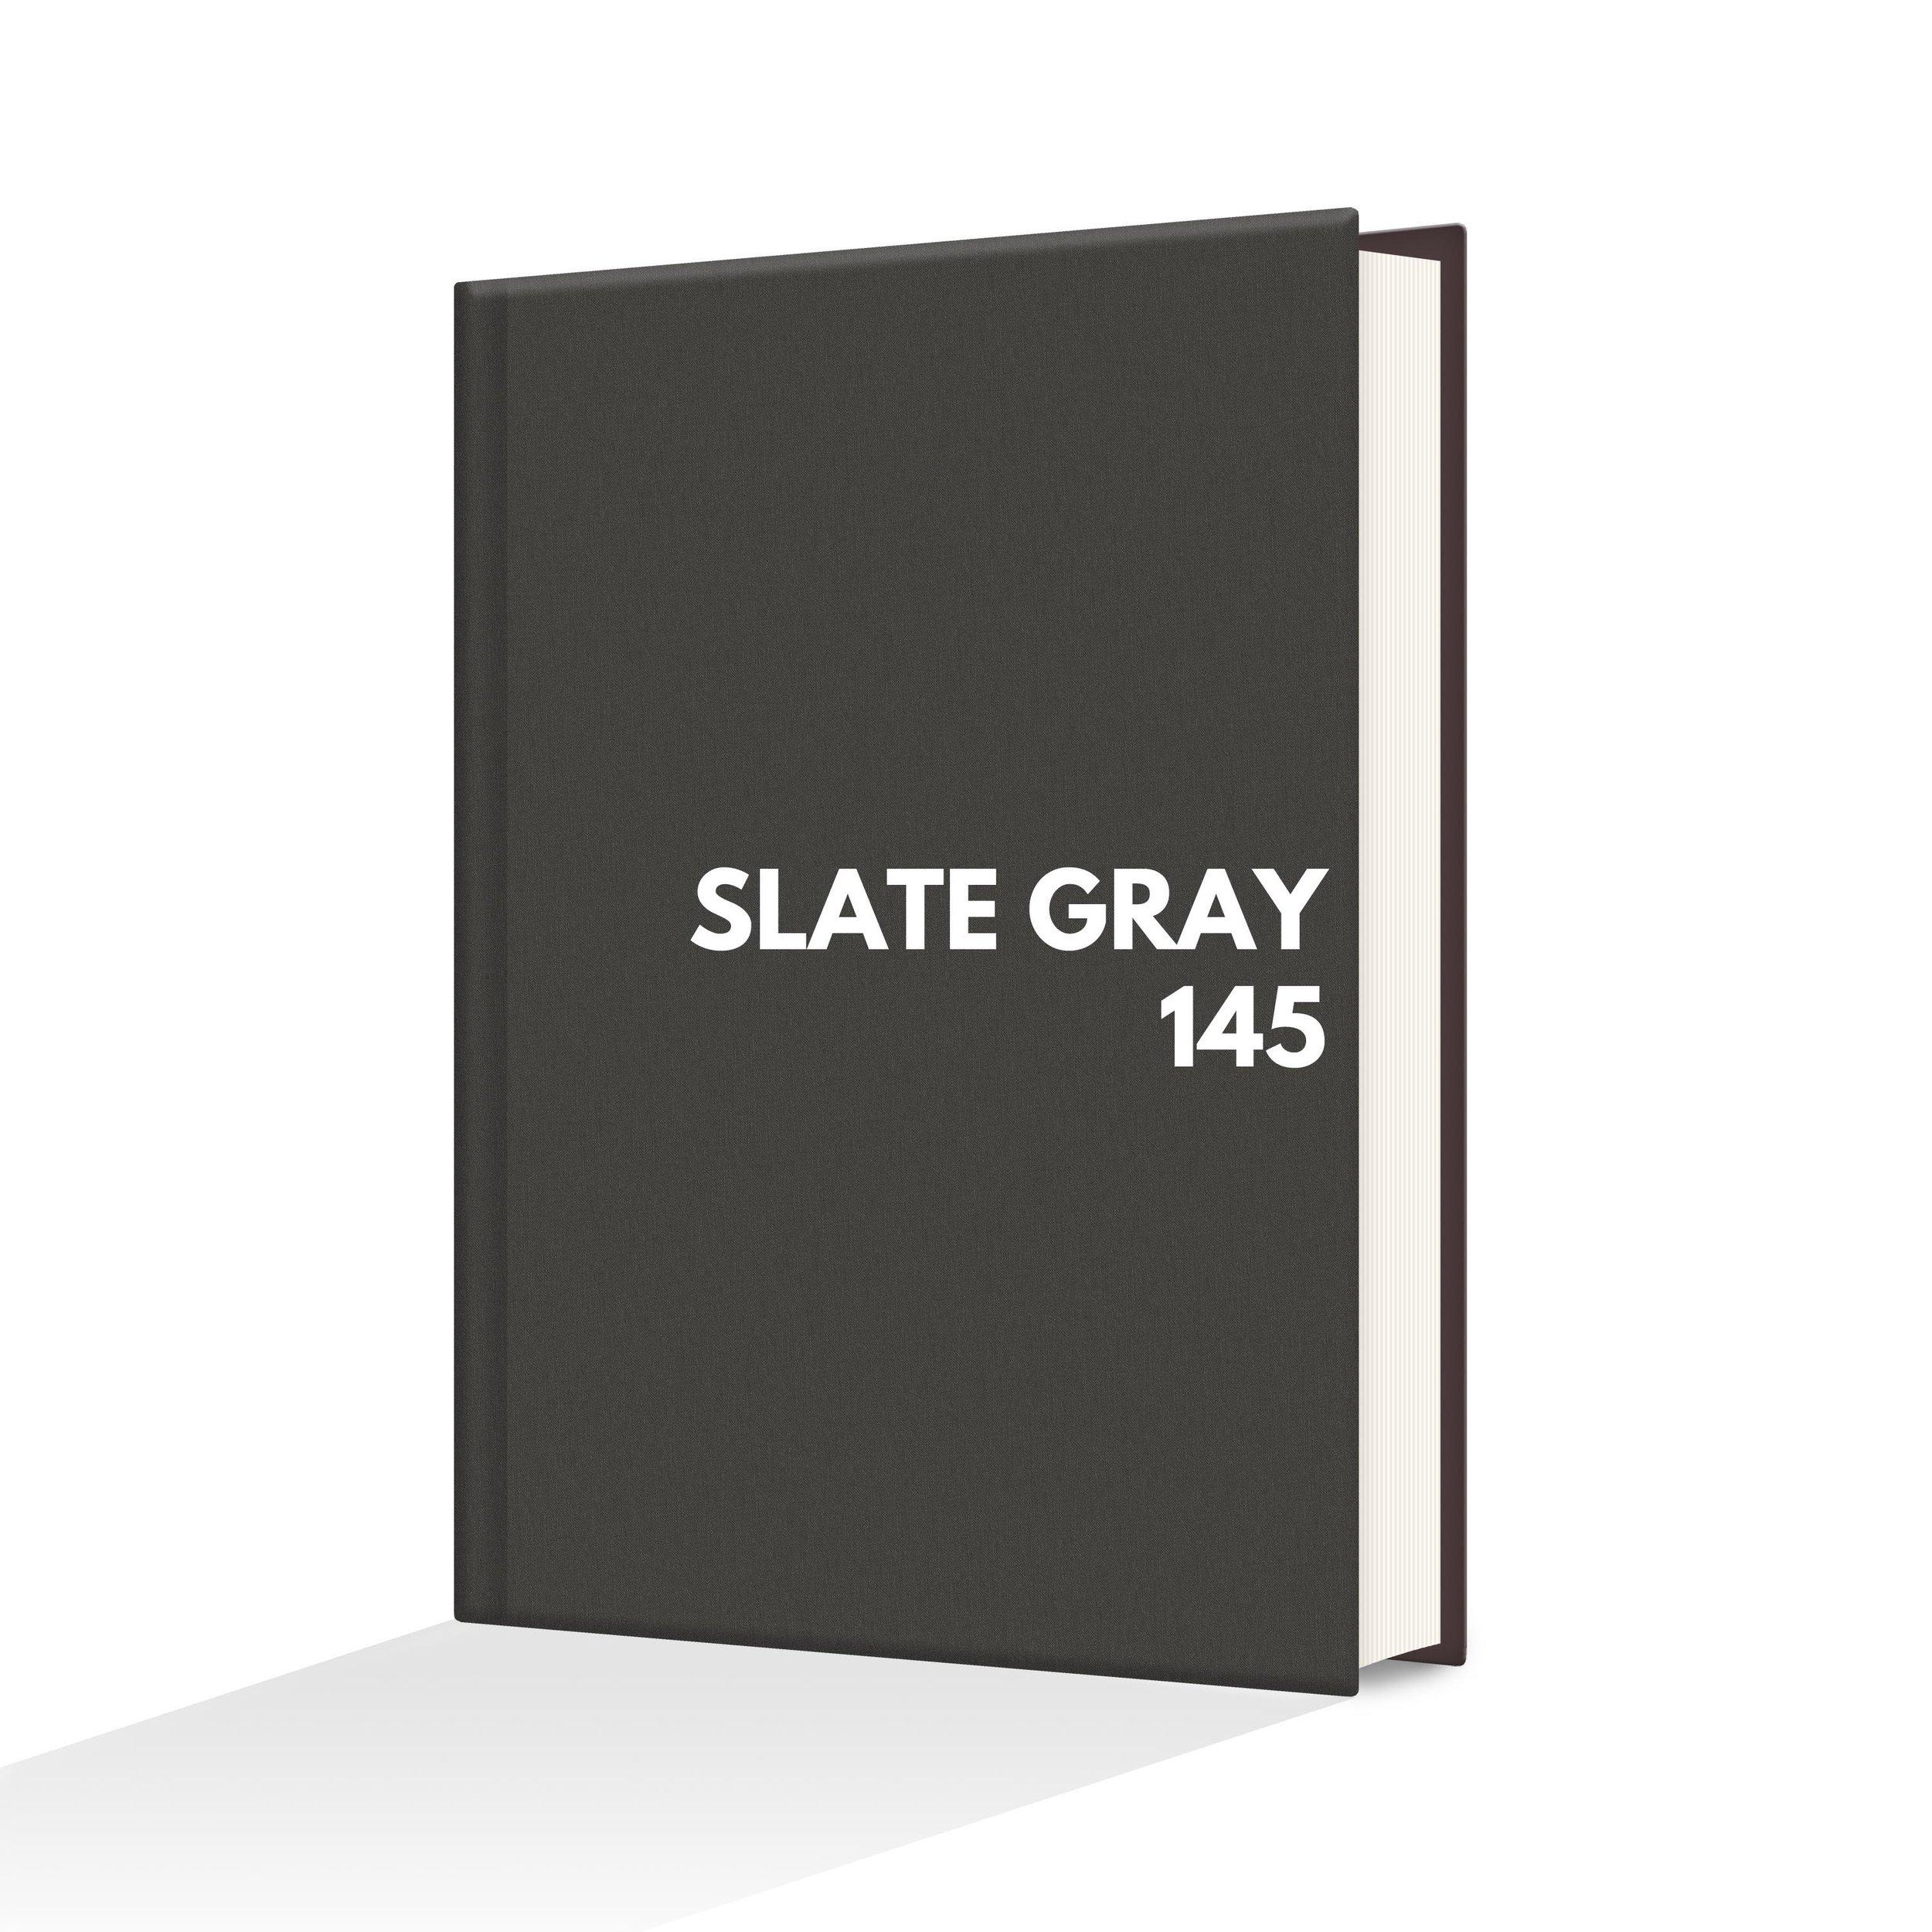 slategrayl145.jpg